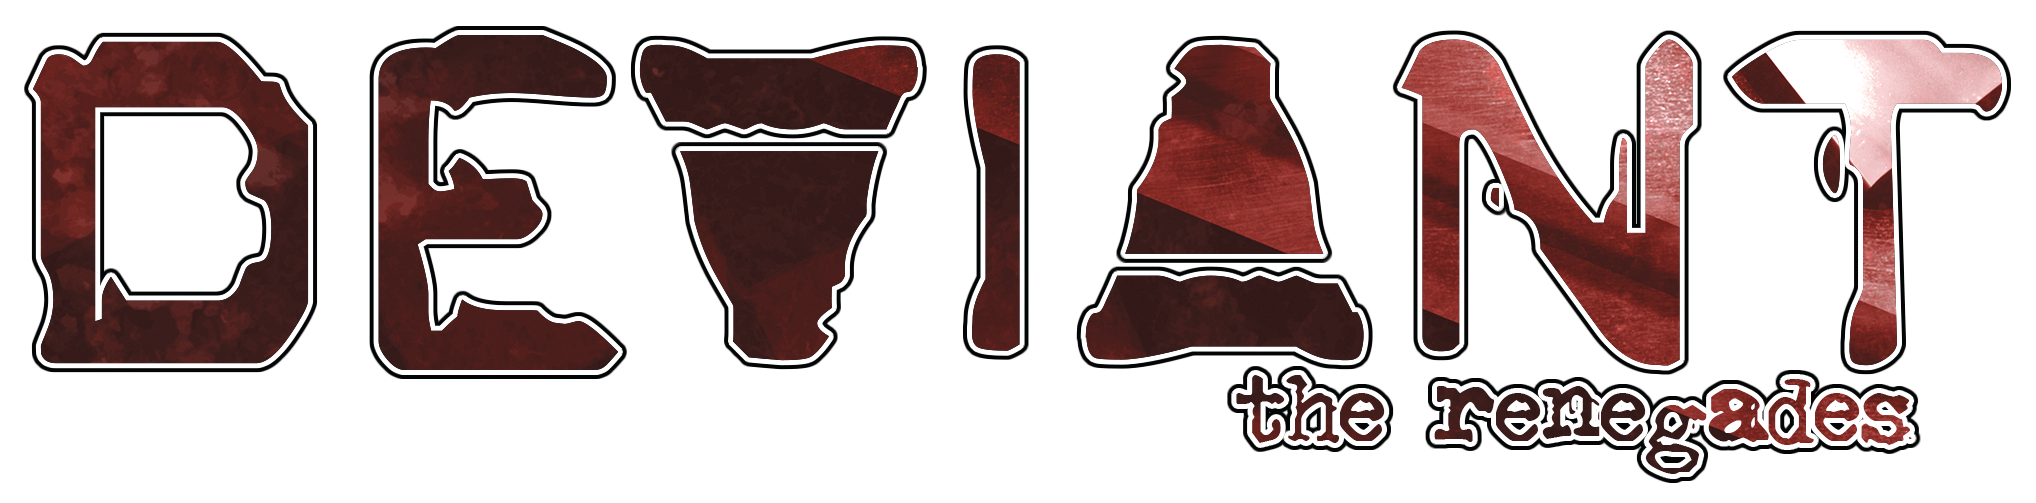 Deviant: The Renegades